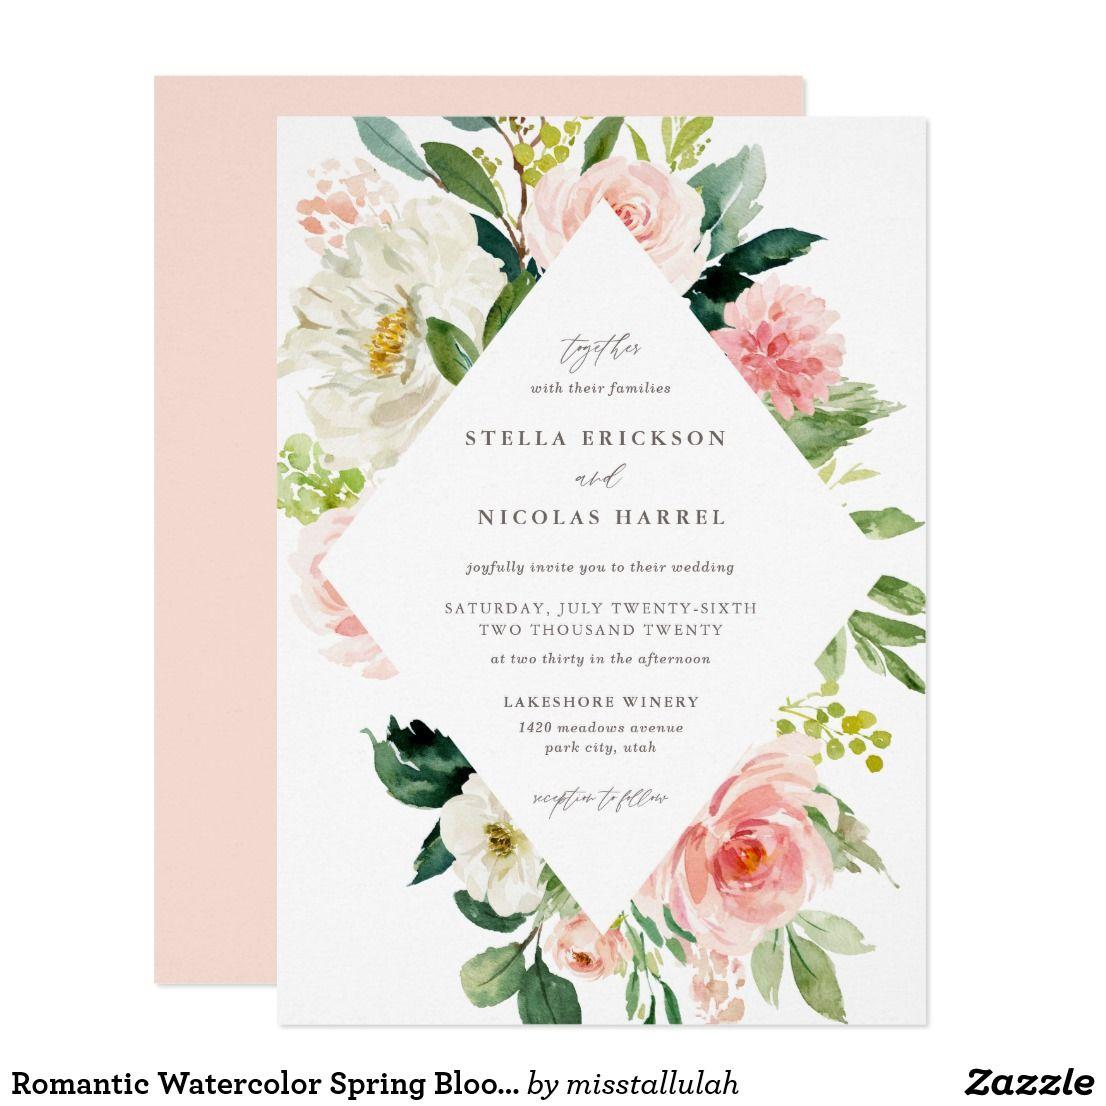 Romantic Watercolor Spring Blooms Wedding Invitation | Zazzle.com | Floral  wedding invitations, Gold wedding invitations, Gold bridal shower  invitations